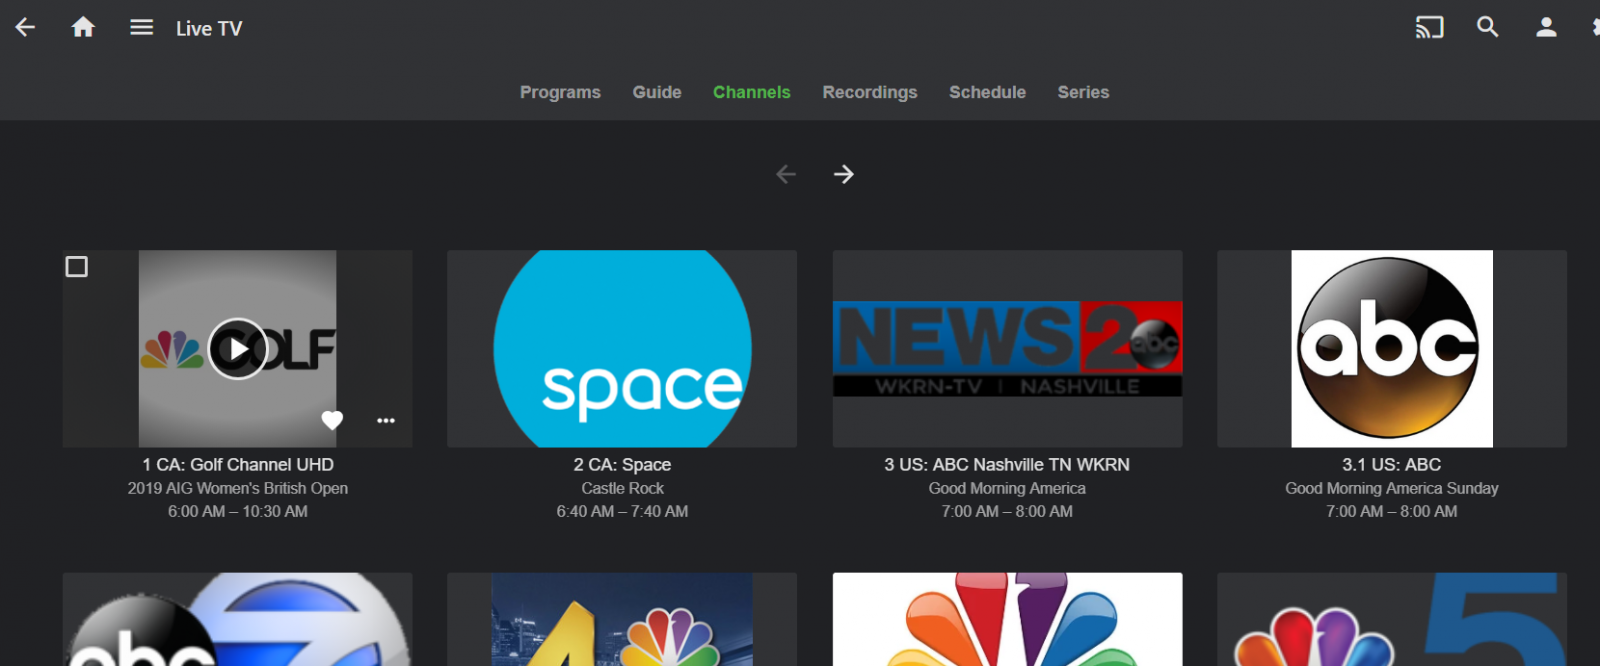 Live TV Setup on Linux Server - Linux - Emby Community